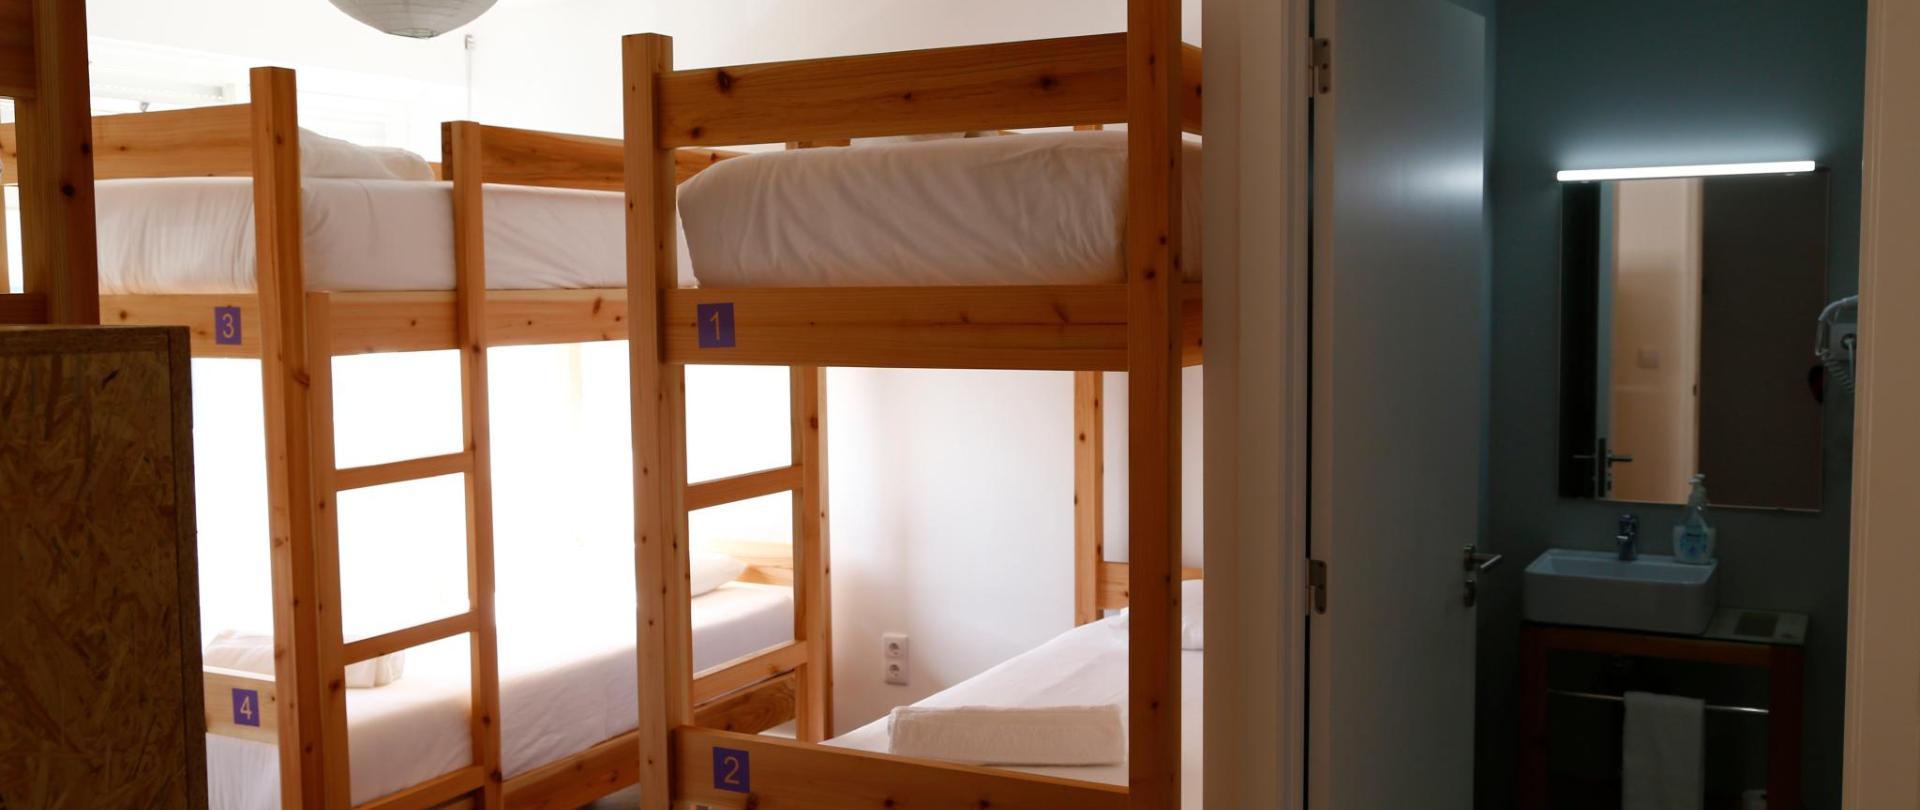 6 bed Dorm - City's Hostel Ponta Delgada (5) .jpg